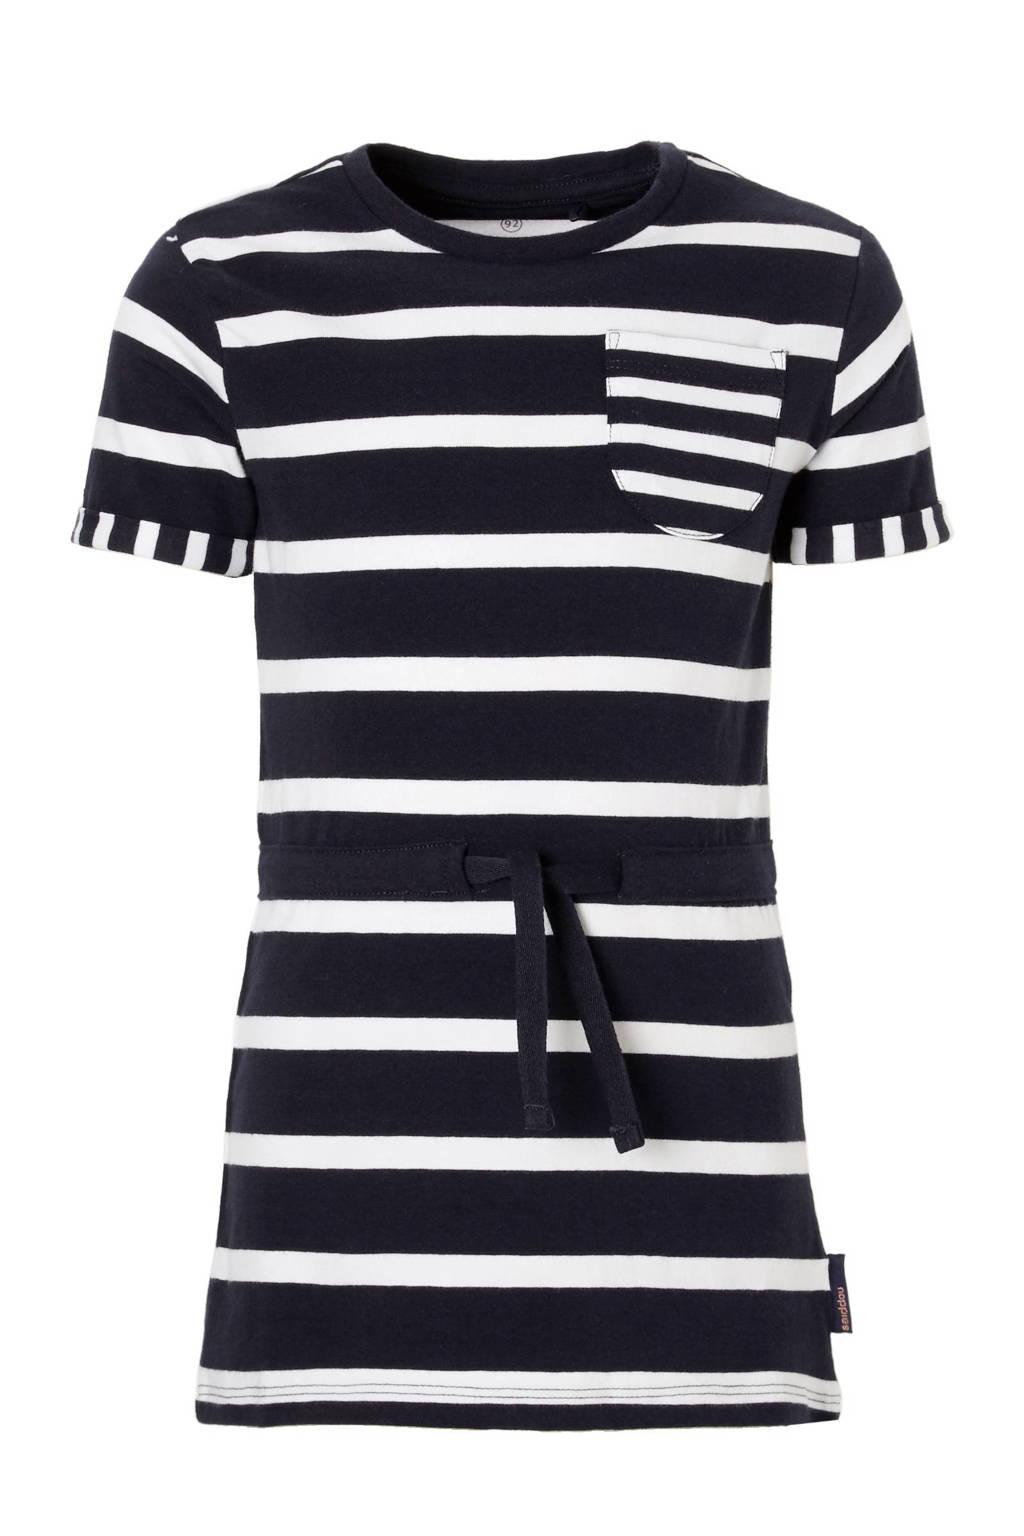 Noppies jurk, Donkerblauw / Wit